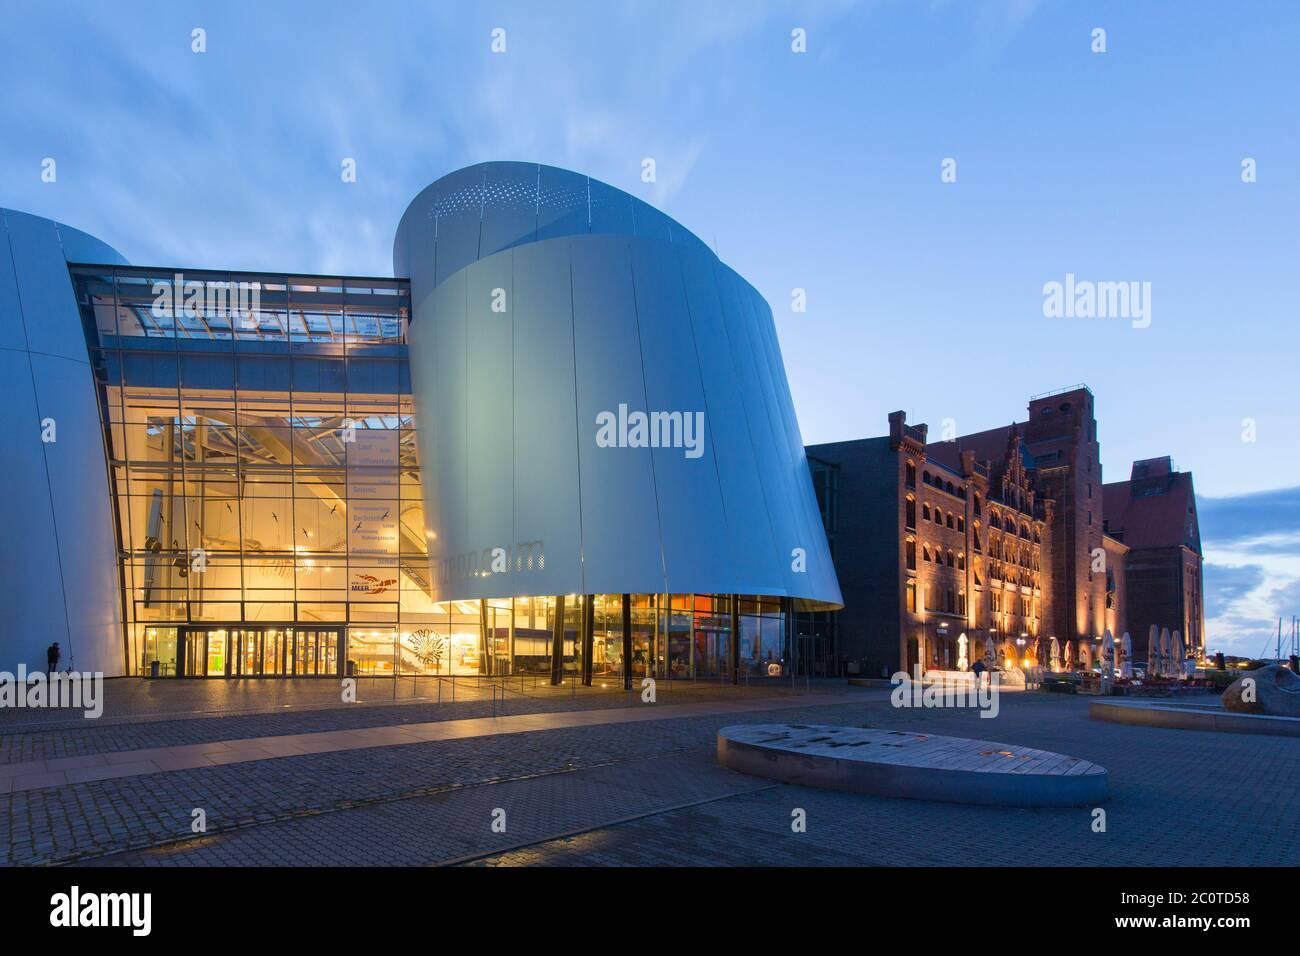 Ozeaneum, public aquarium in the city Stralsund, Mecklenburg-Vorpommern, Germany Stock Photo